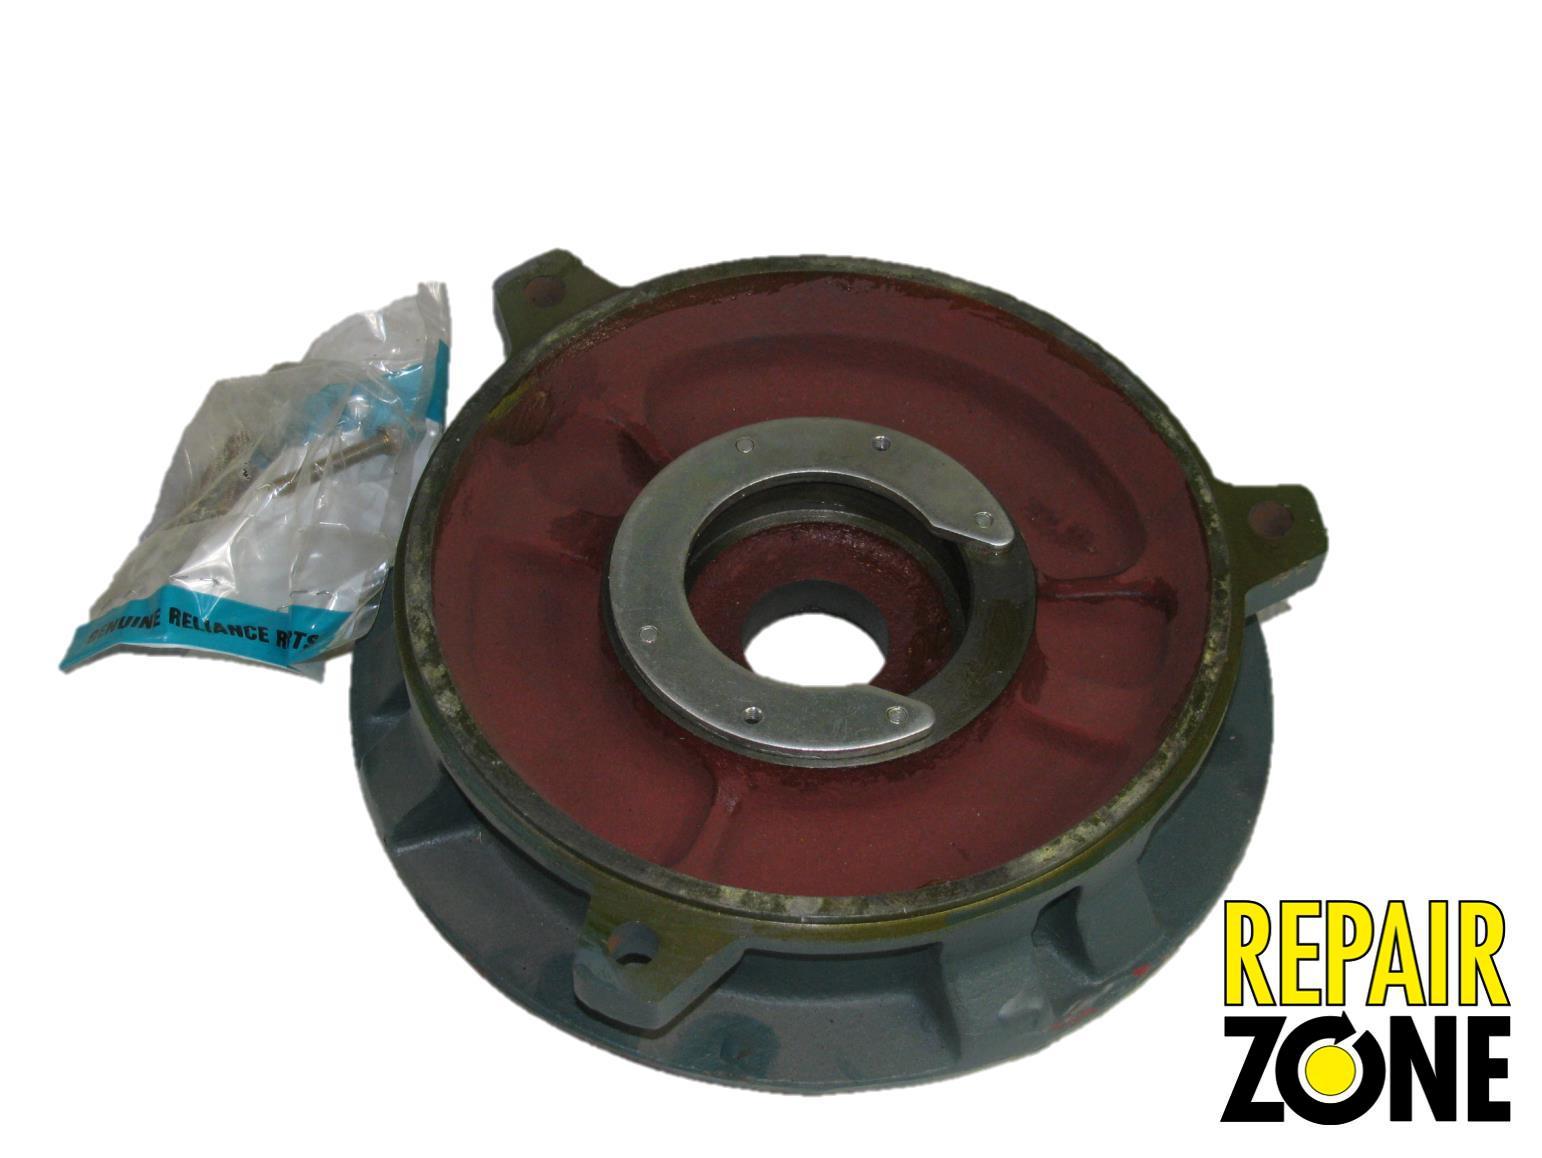 K18g32 Reliance Motor Parts New Ebay